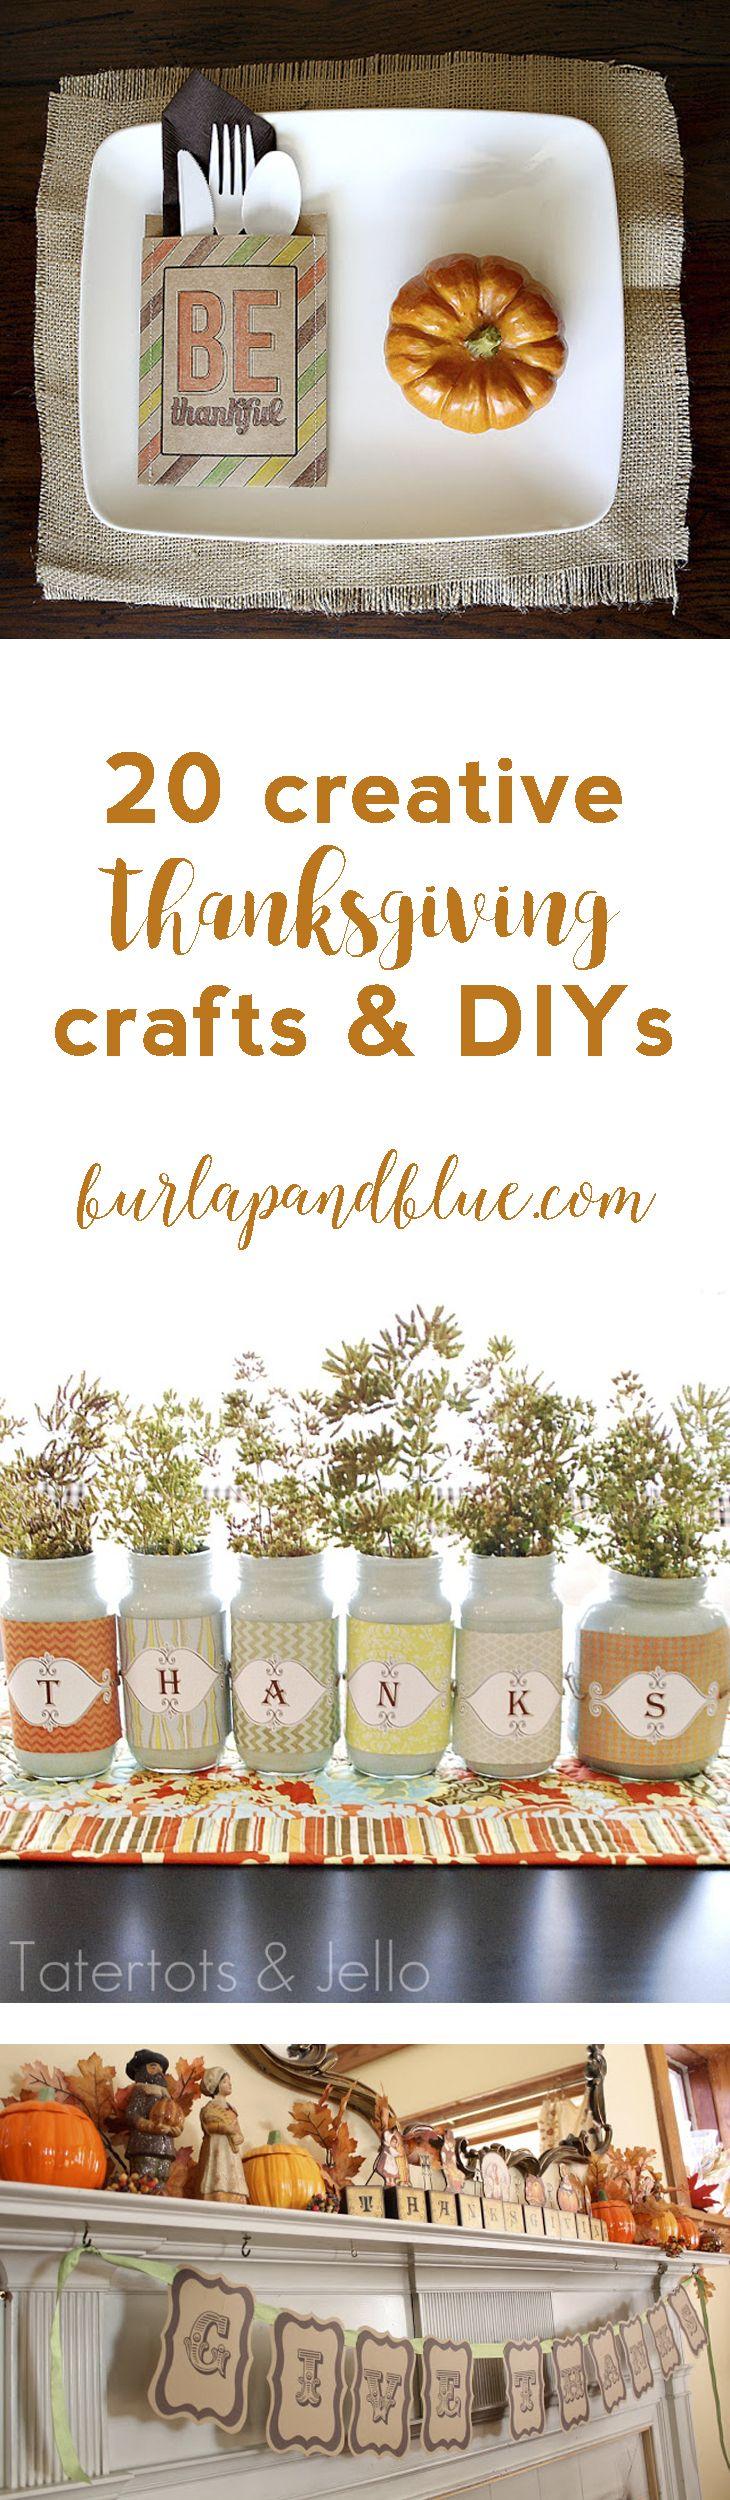 20 creative thanksgiving tutorials and crafts